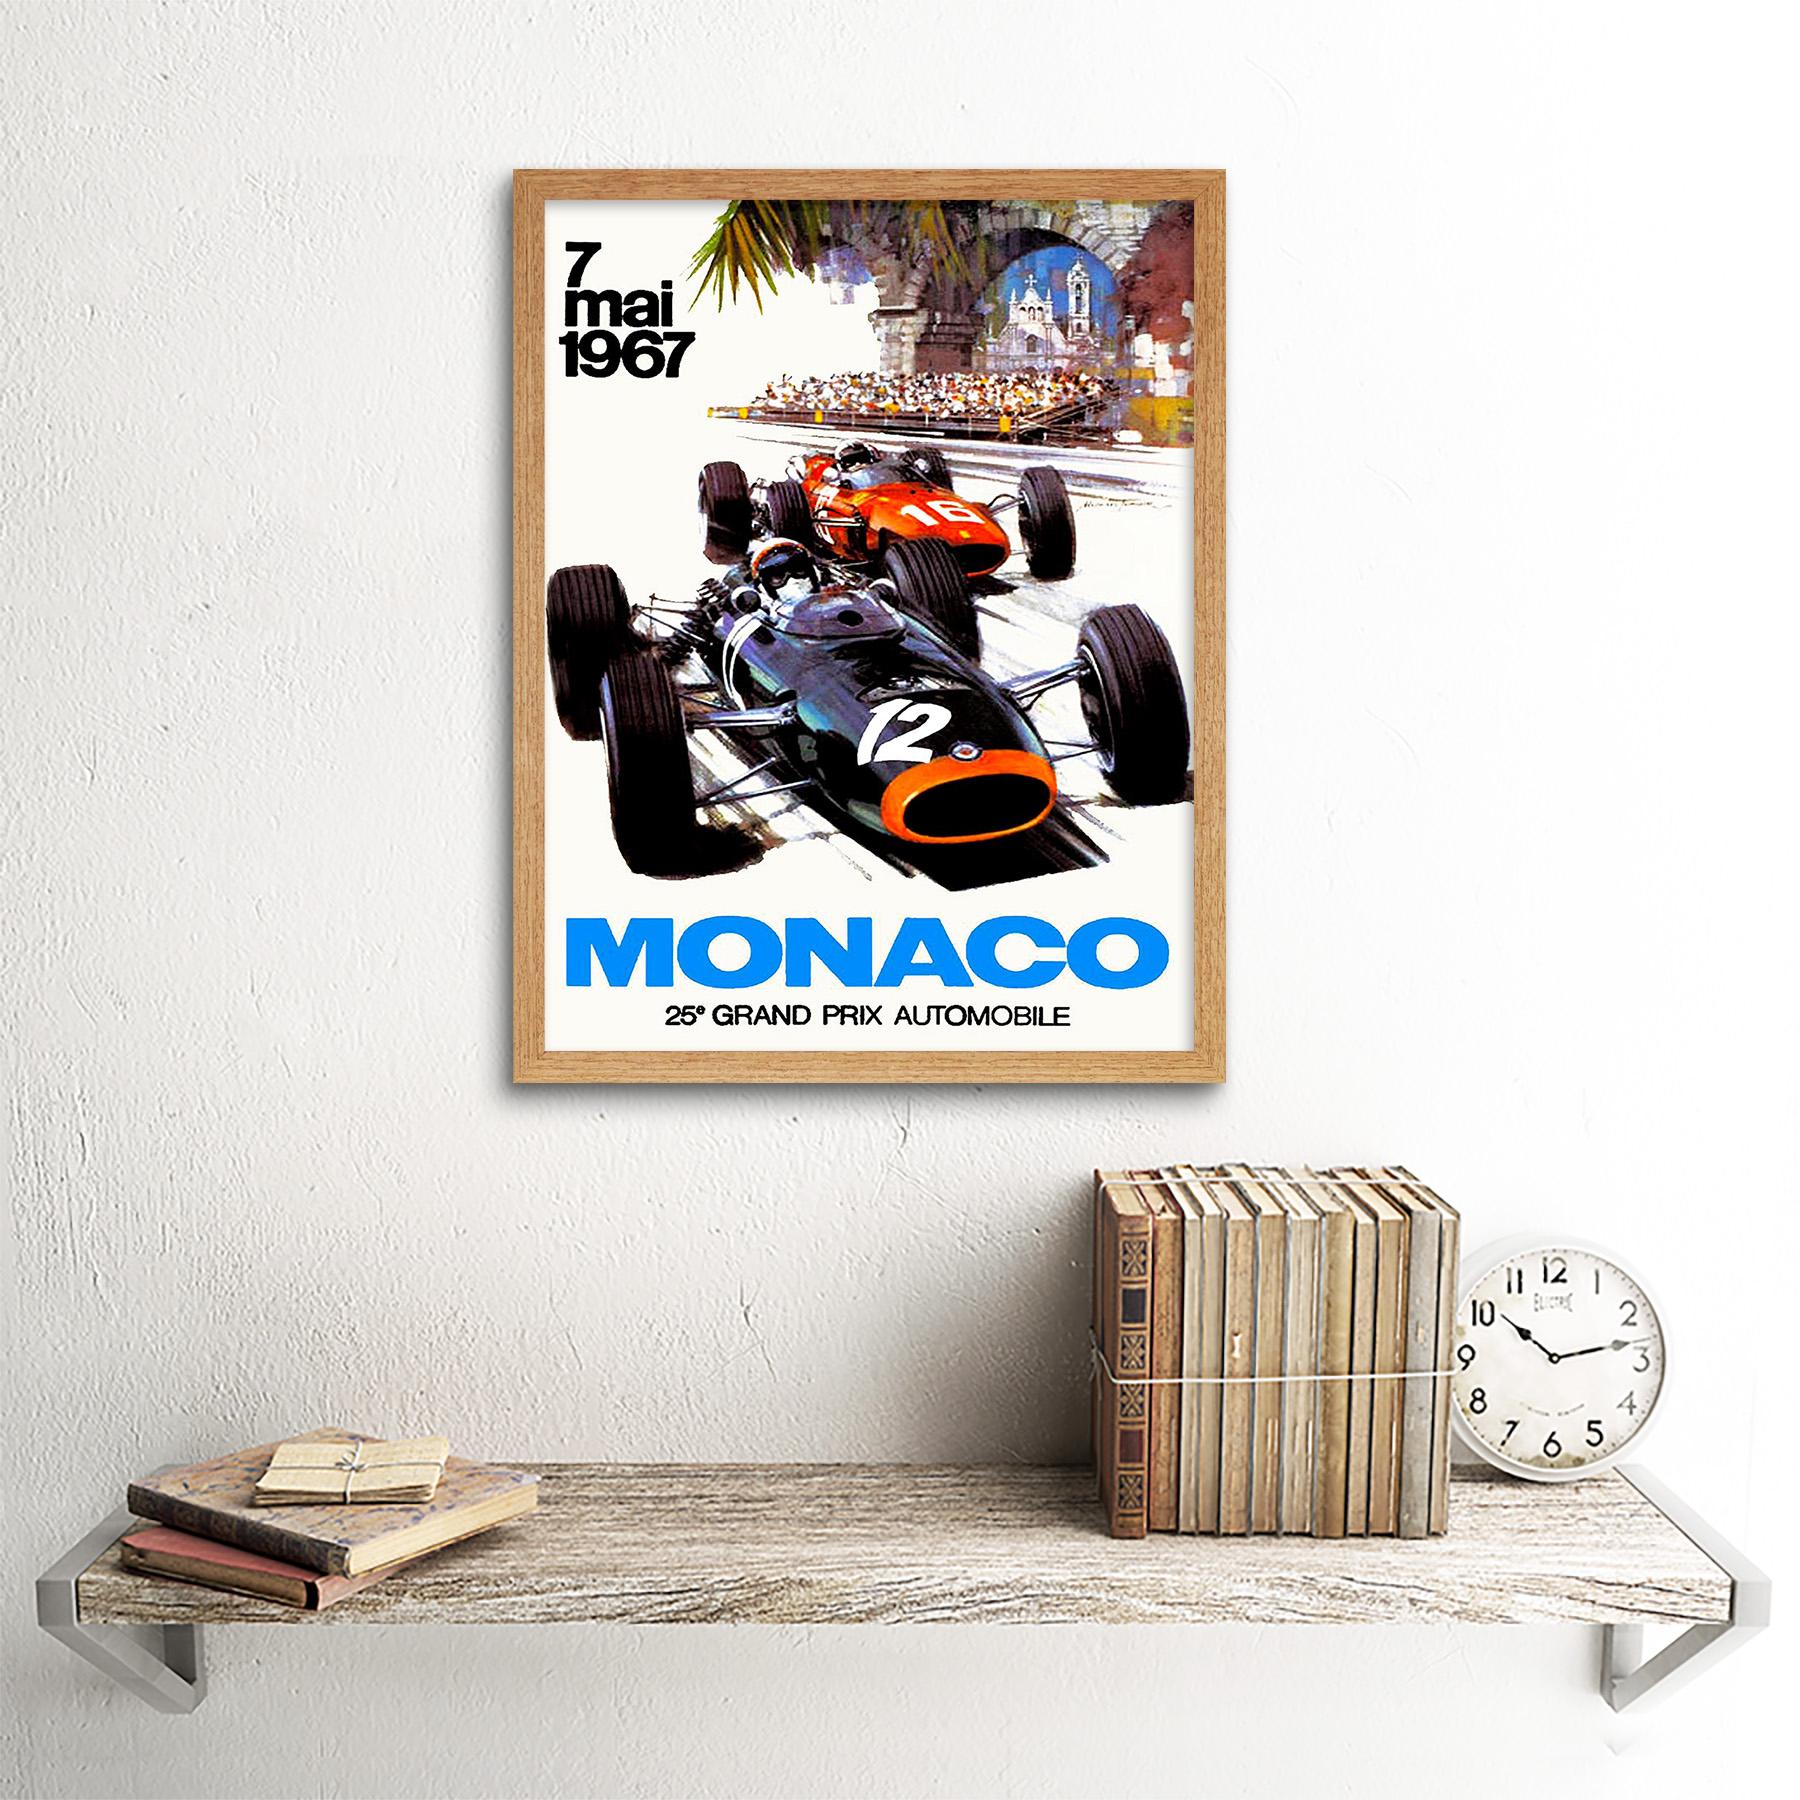 Vintage-Transport-Monaco-25-Grand-Prix-Automobile-1967-Race-12X16-Framed-Print thumbnail 13